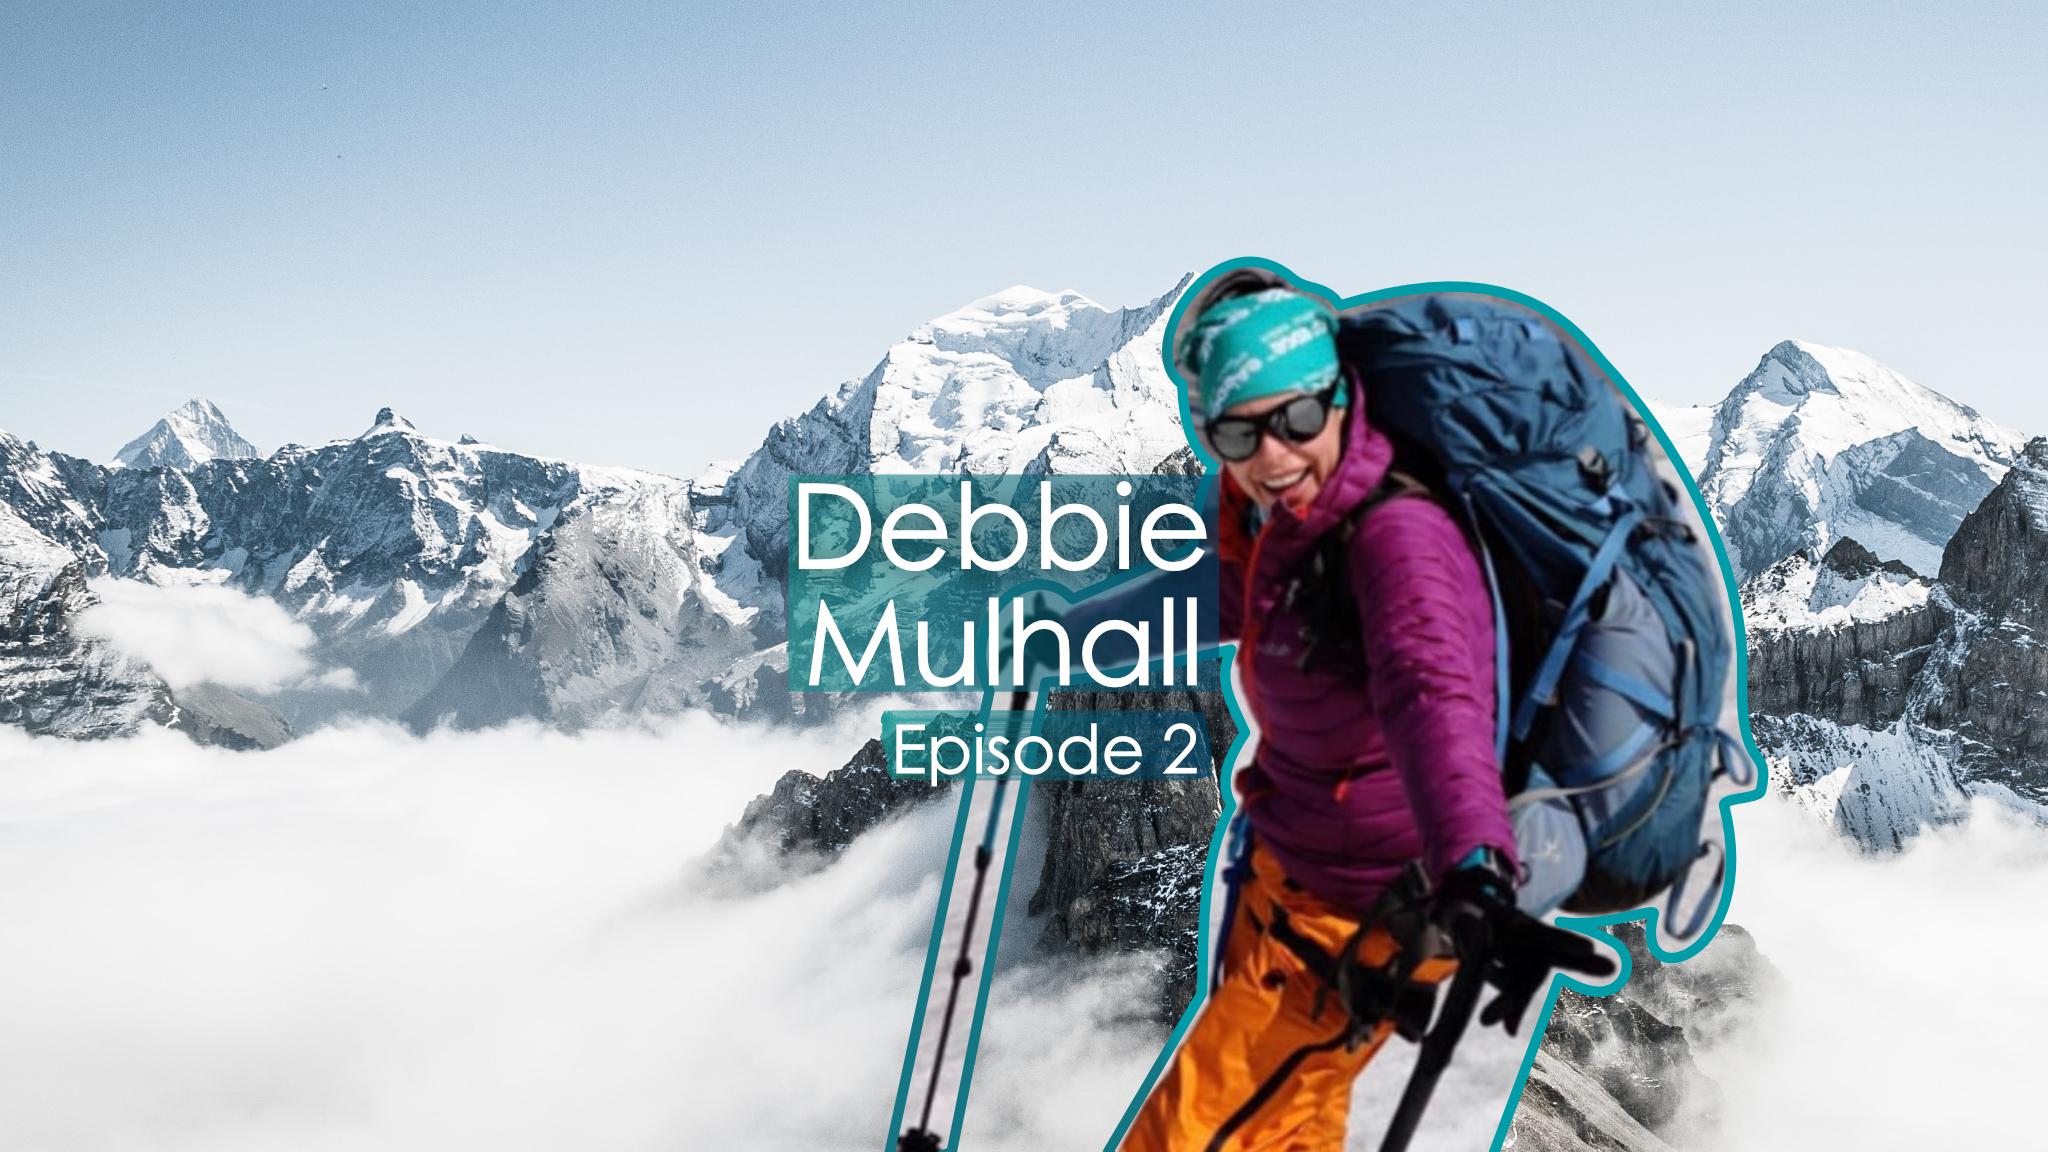 Debbie Mulhall Episode 2